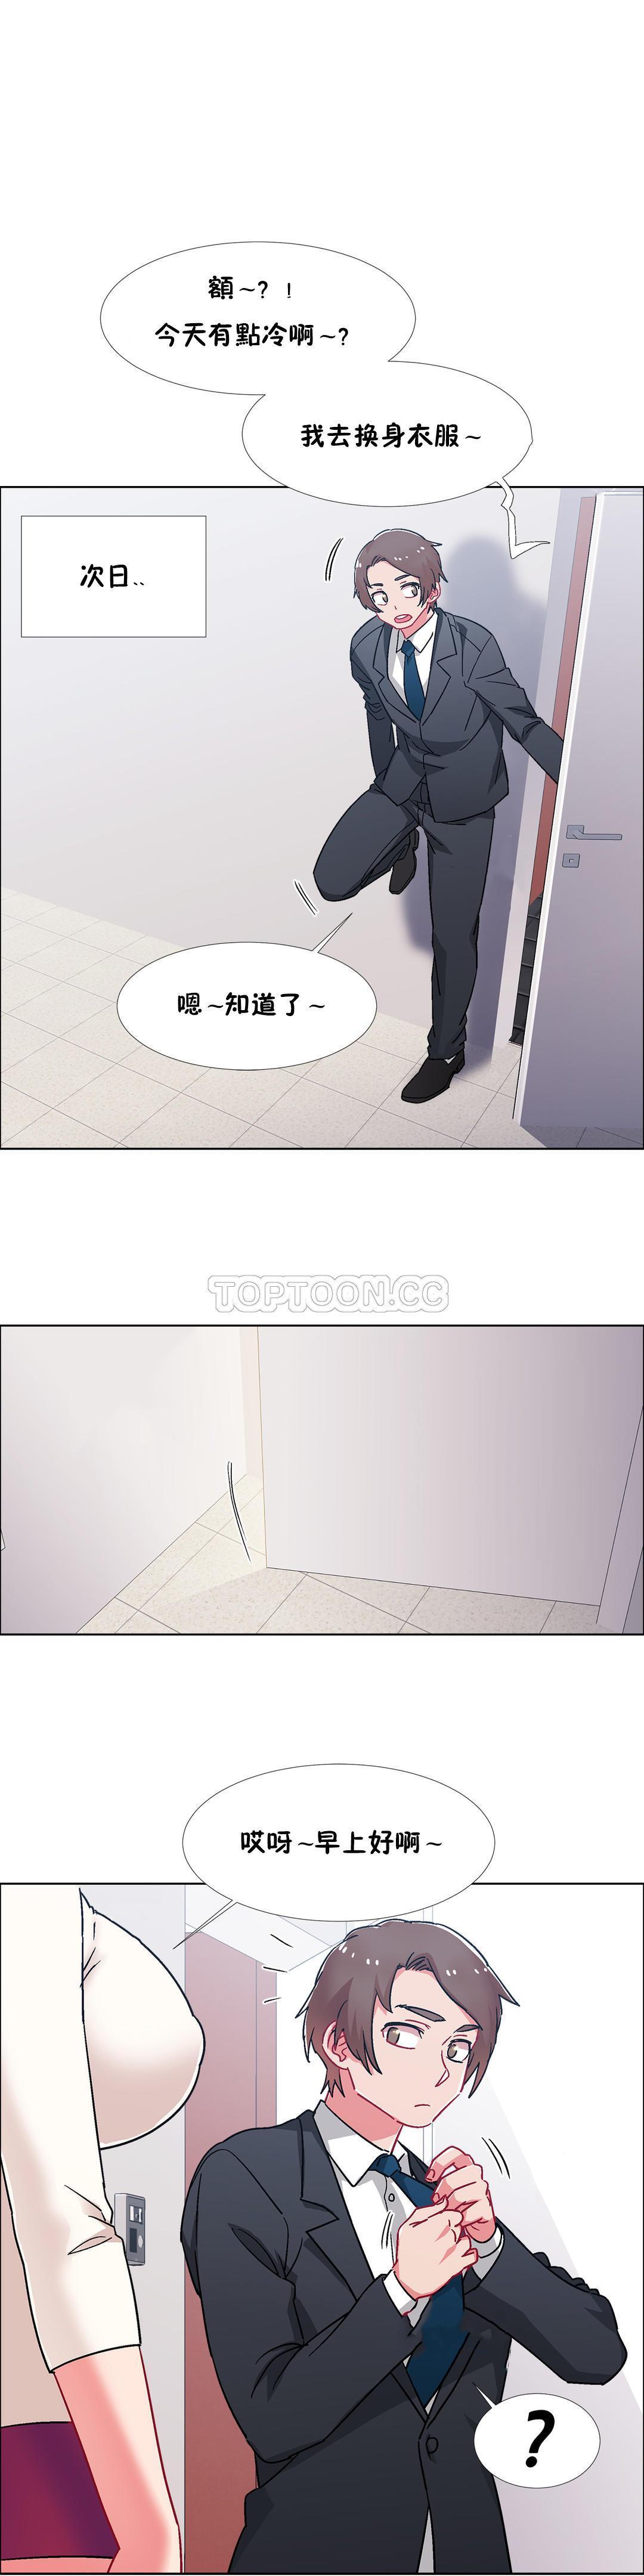 [Studio Wannabe] Rental Girls | 出租女郎 Ch. 33-58 [Chinese]  第二季 完结 425